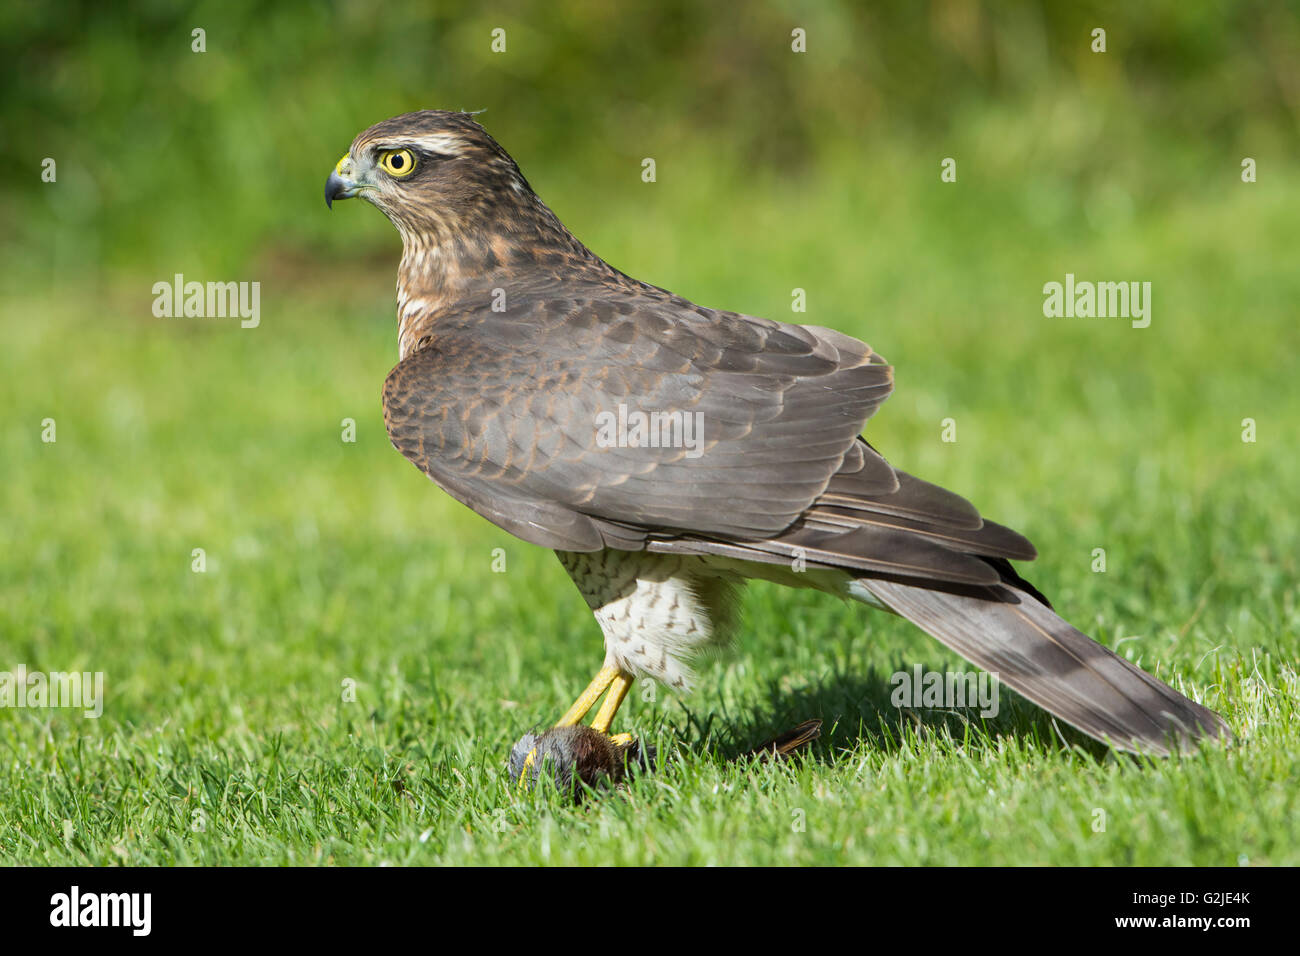 how to catch a sparrowhawk